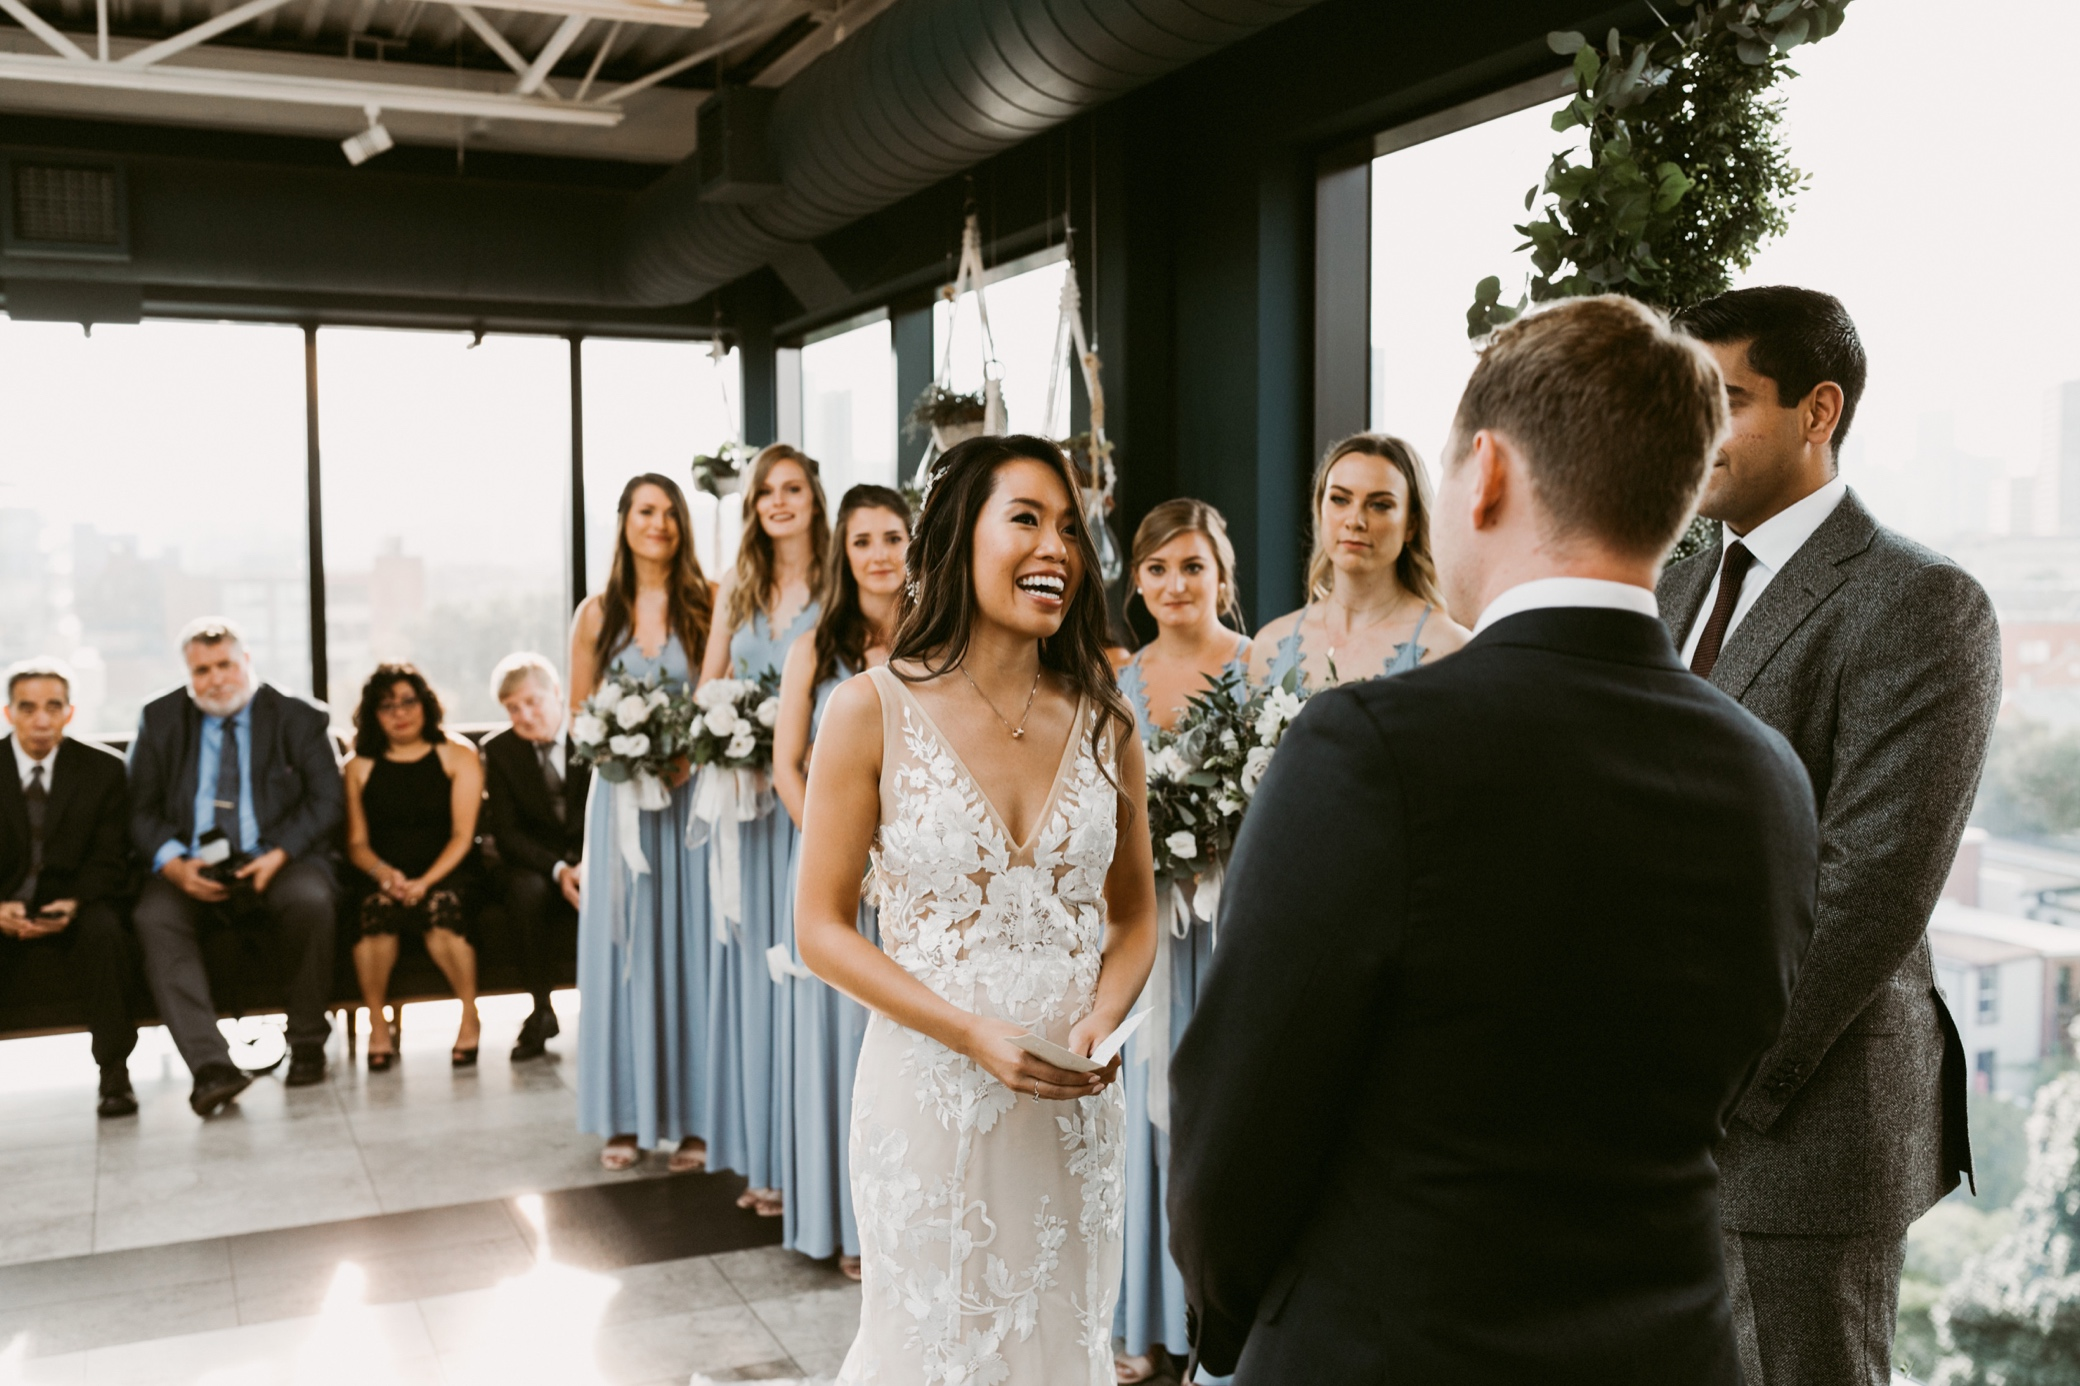 063_The Broadview Hotel Wedding (437 of 913).jpg